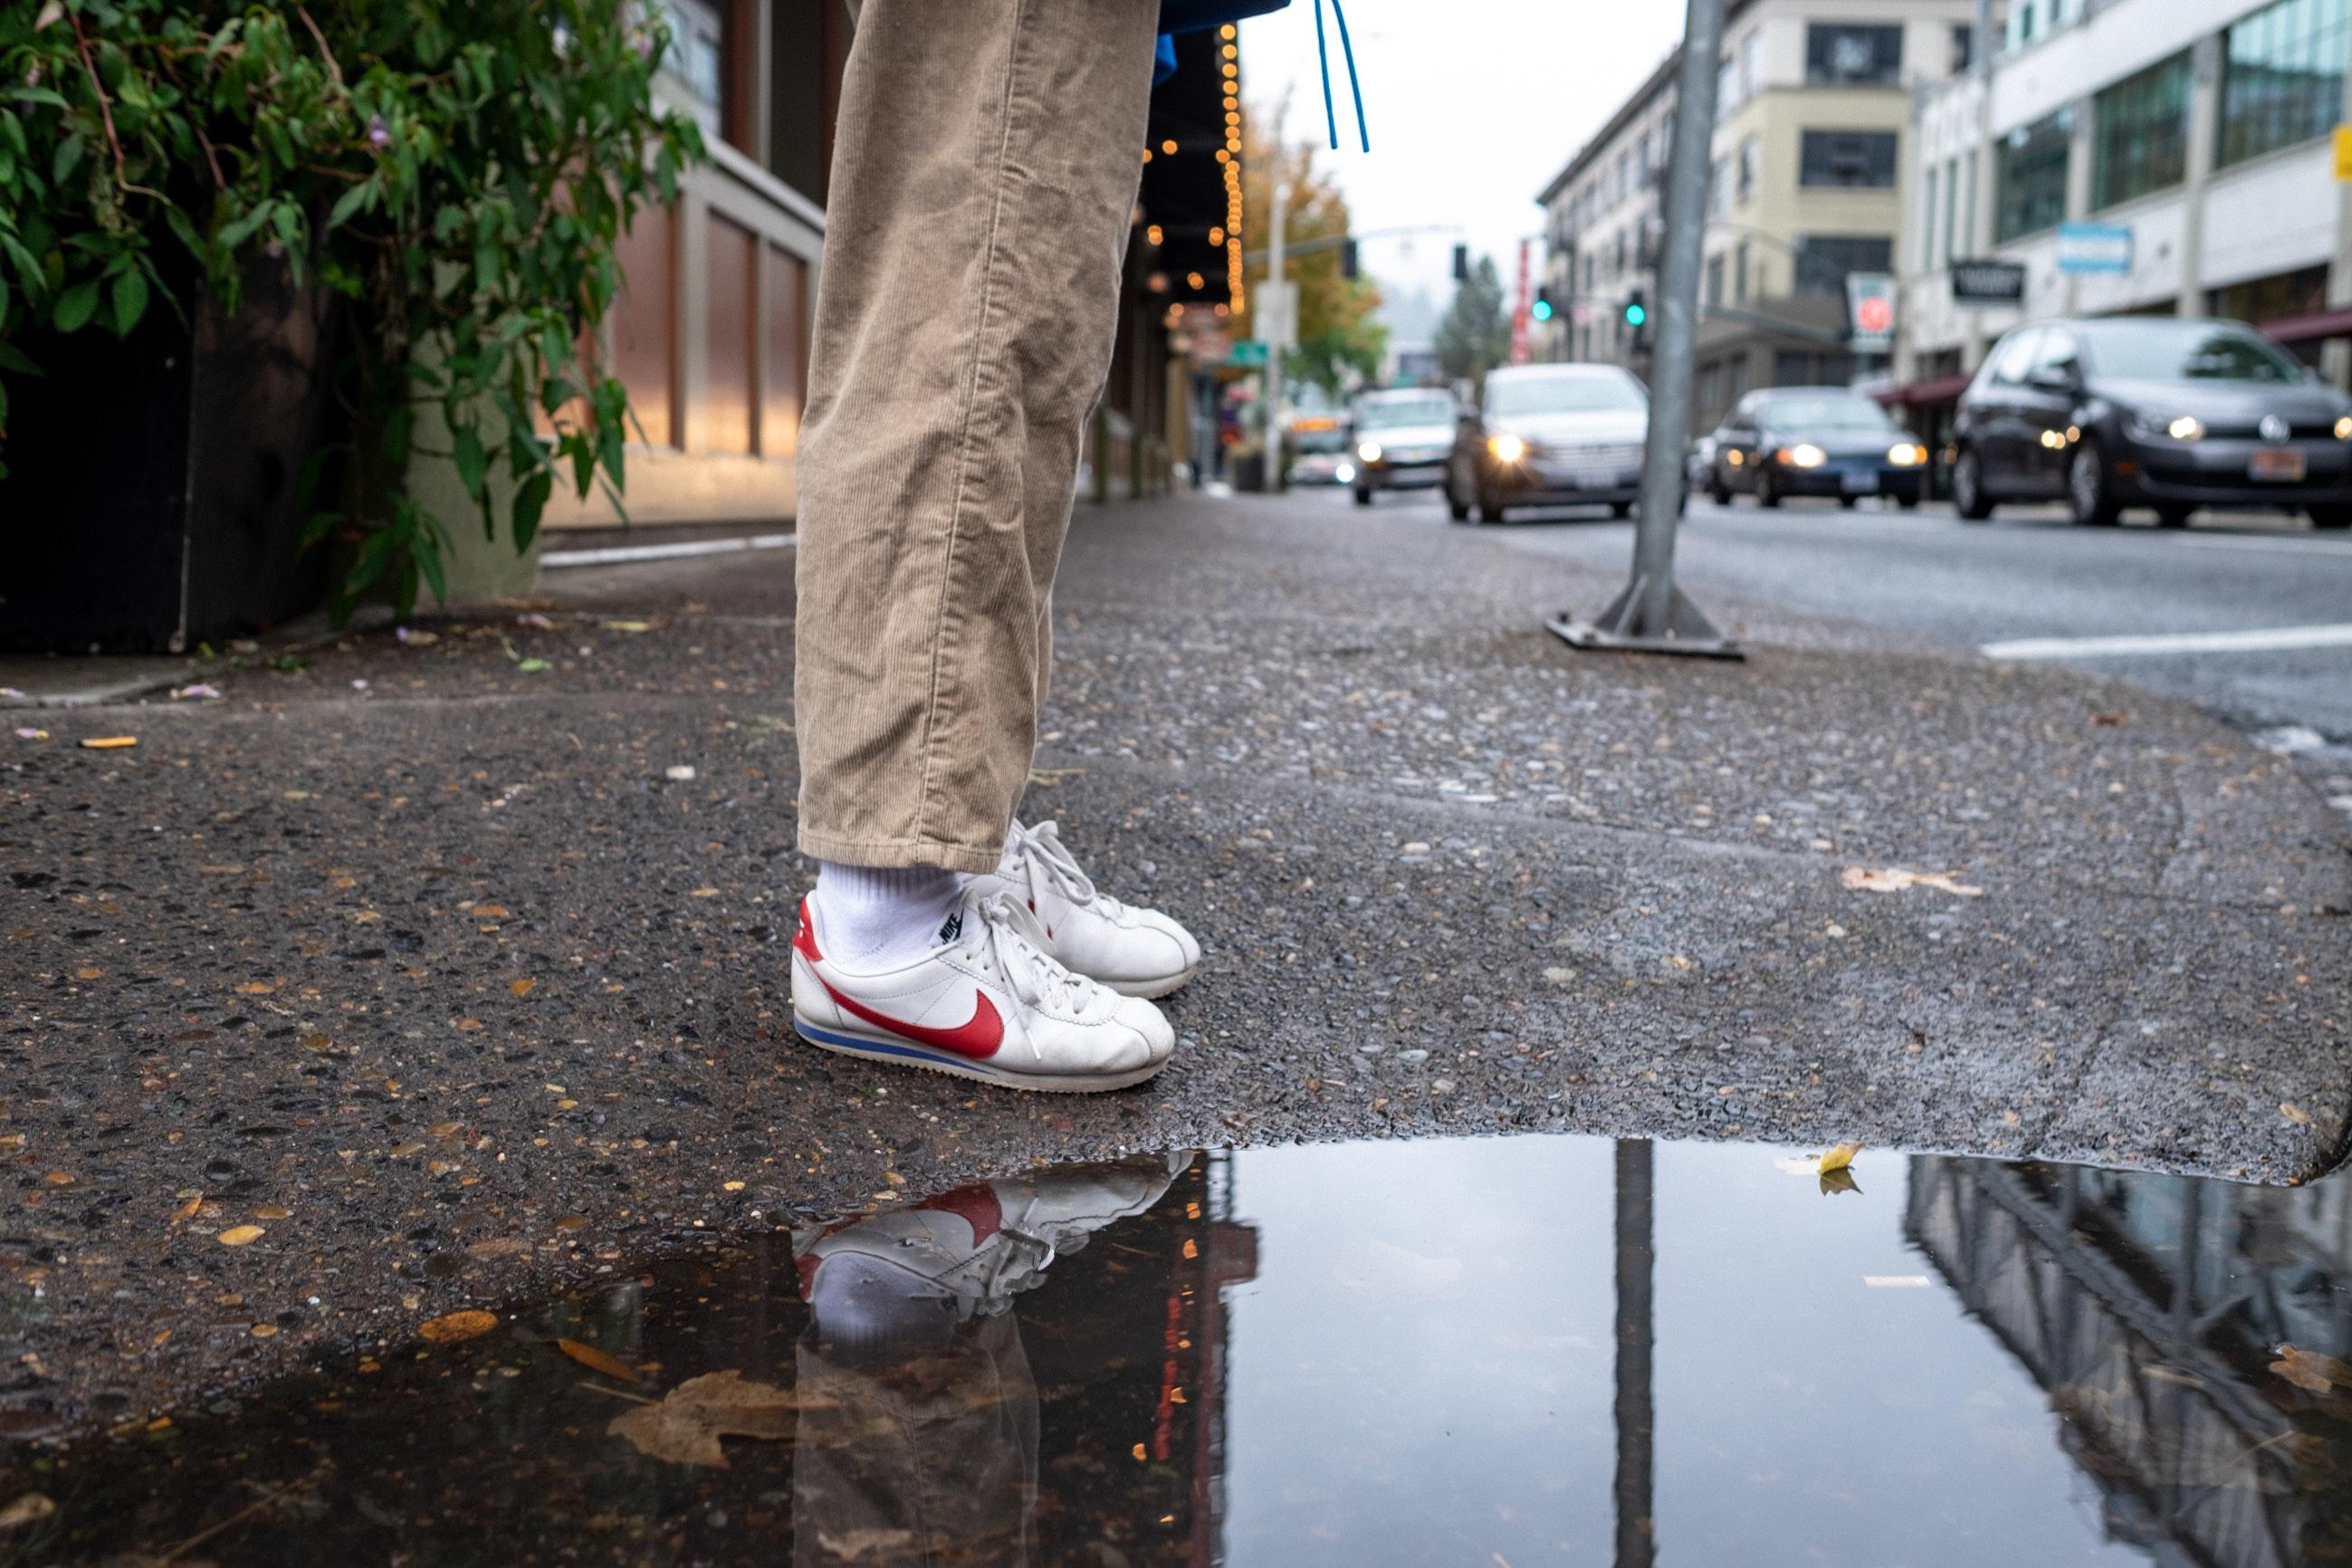 2ce592e4a75 είδη υπόδησης ανθρώπινο πόδι πόδι παπούτσι πεζοδρόμιο δημόσιος χώρος  στιγμιότυπο νερό οδόστρωμα ασφάλτος δέντρο δρόμος υποδομή